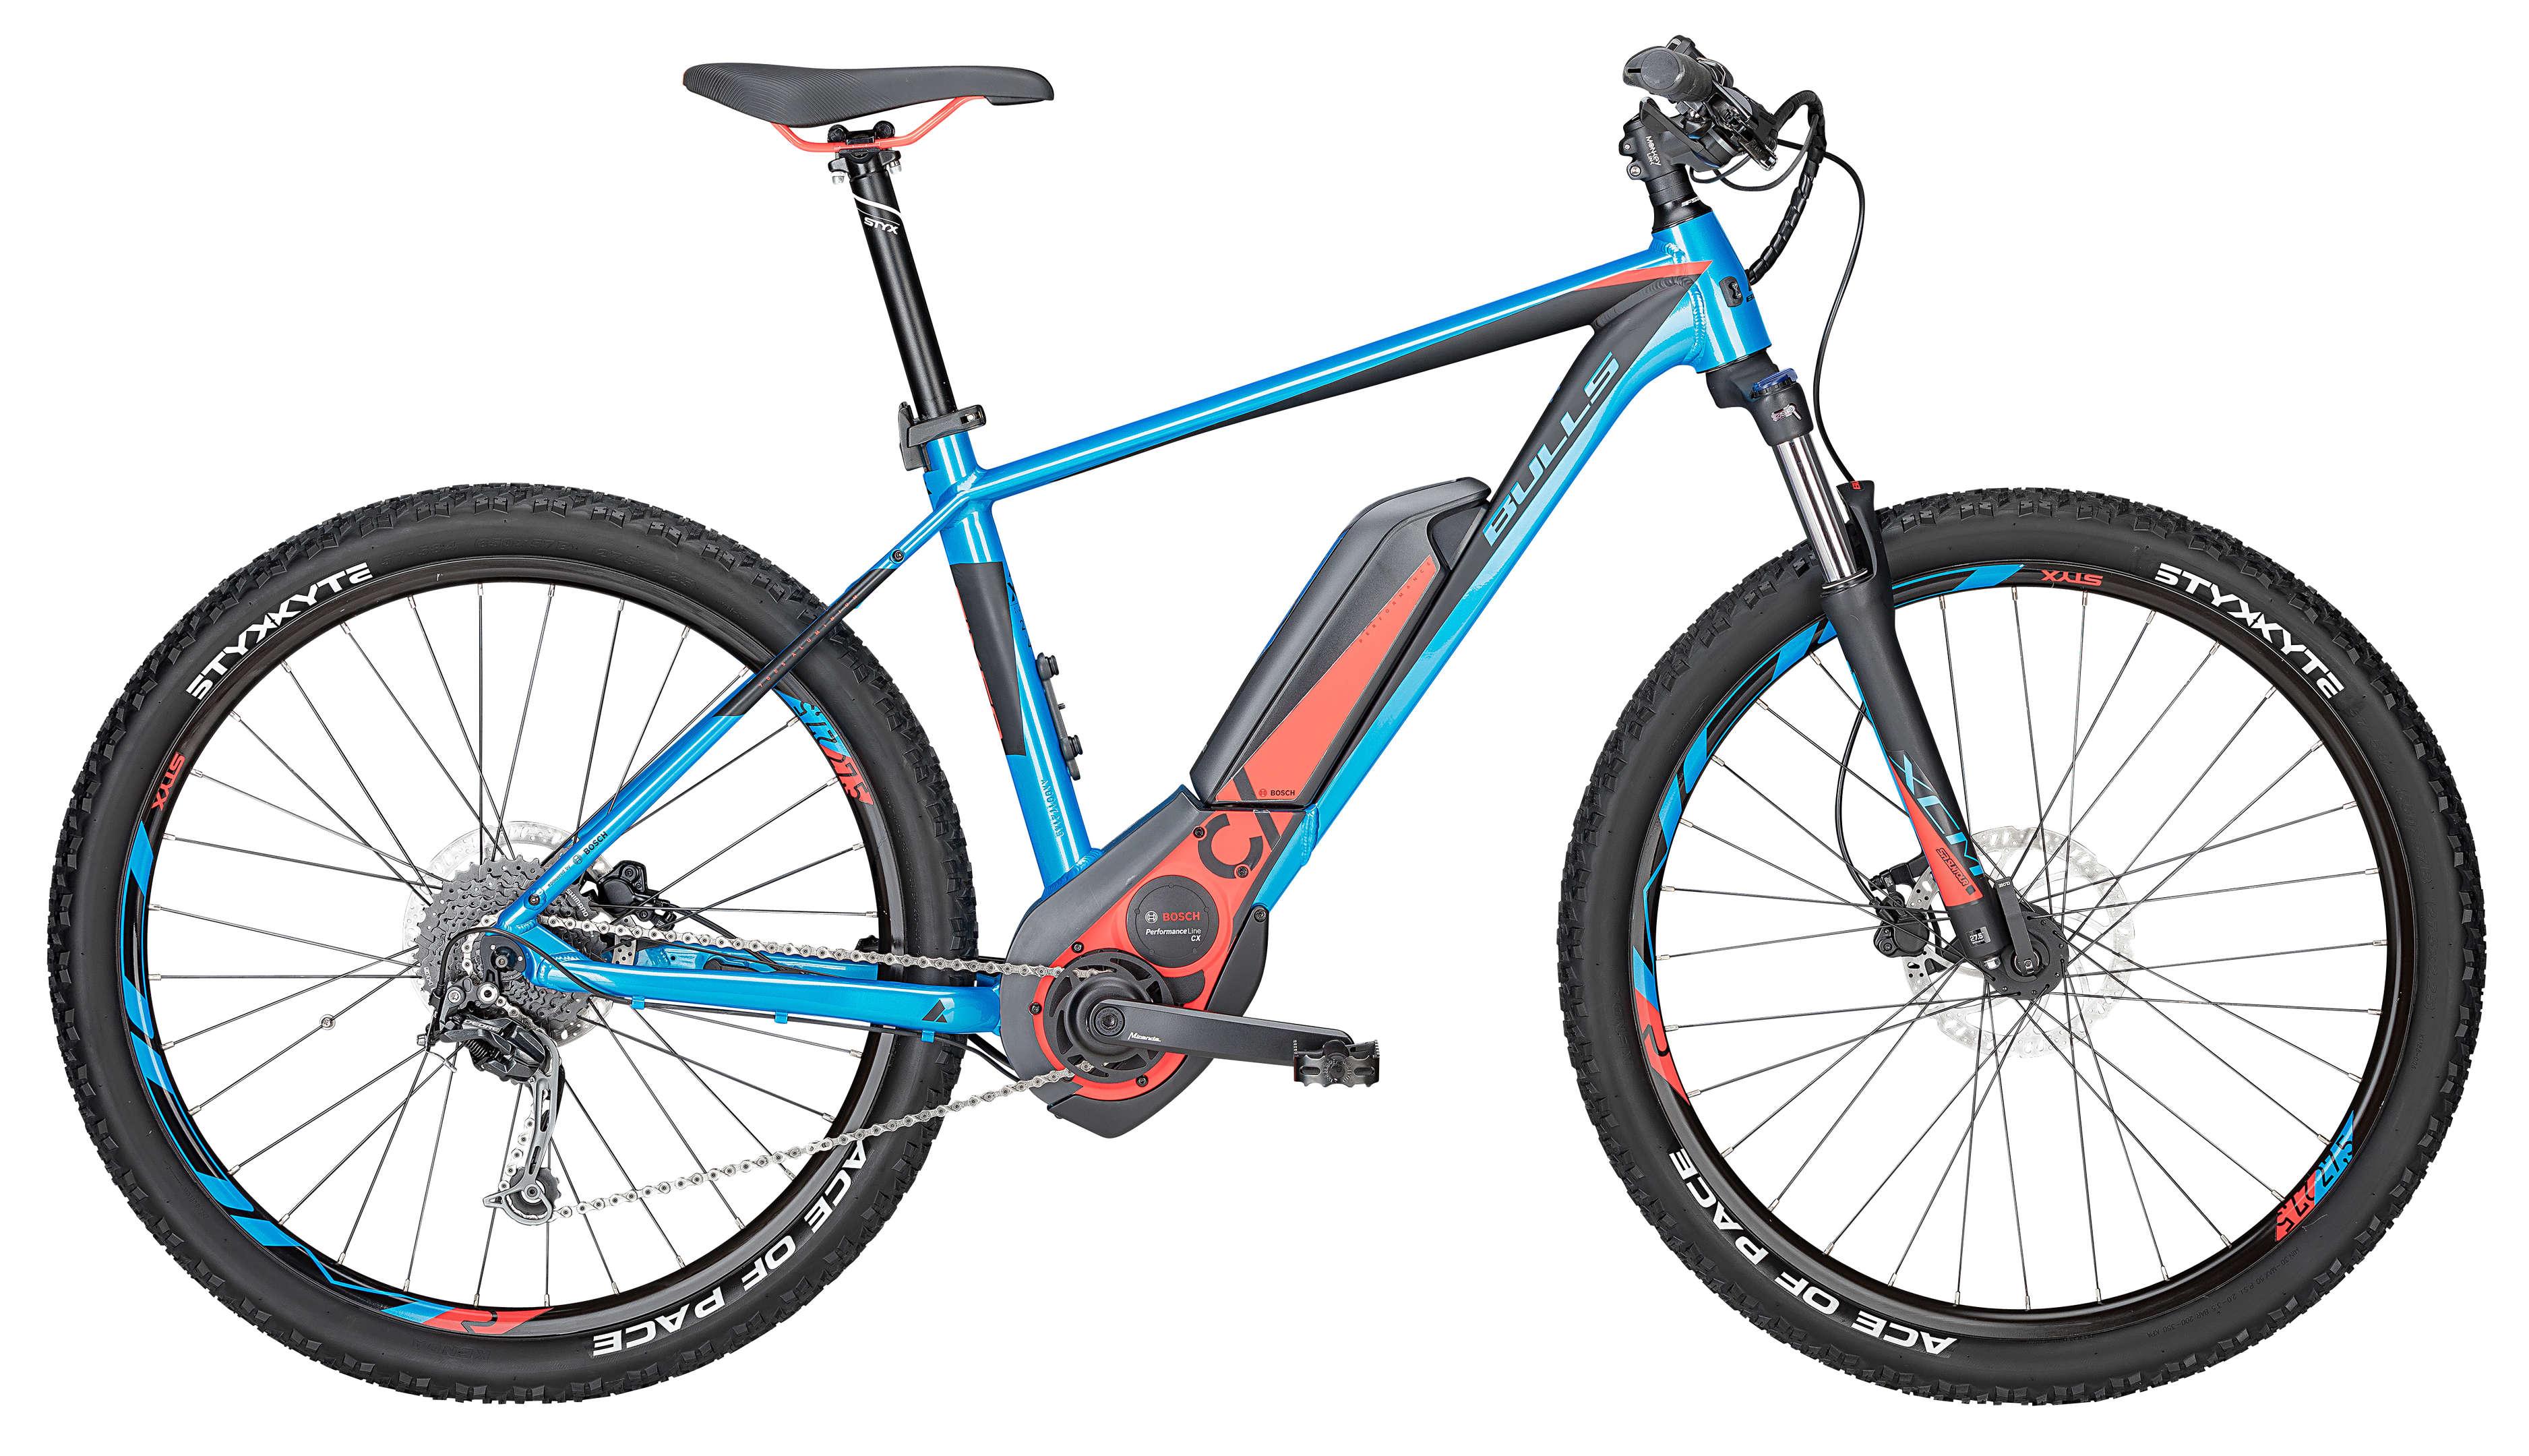 BULLS E-Bike SIX50 E1 CX